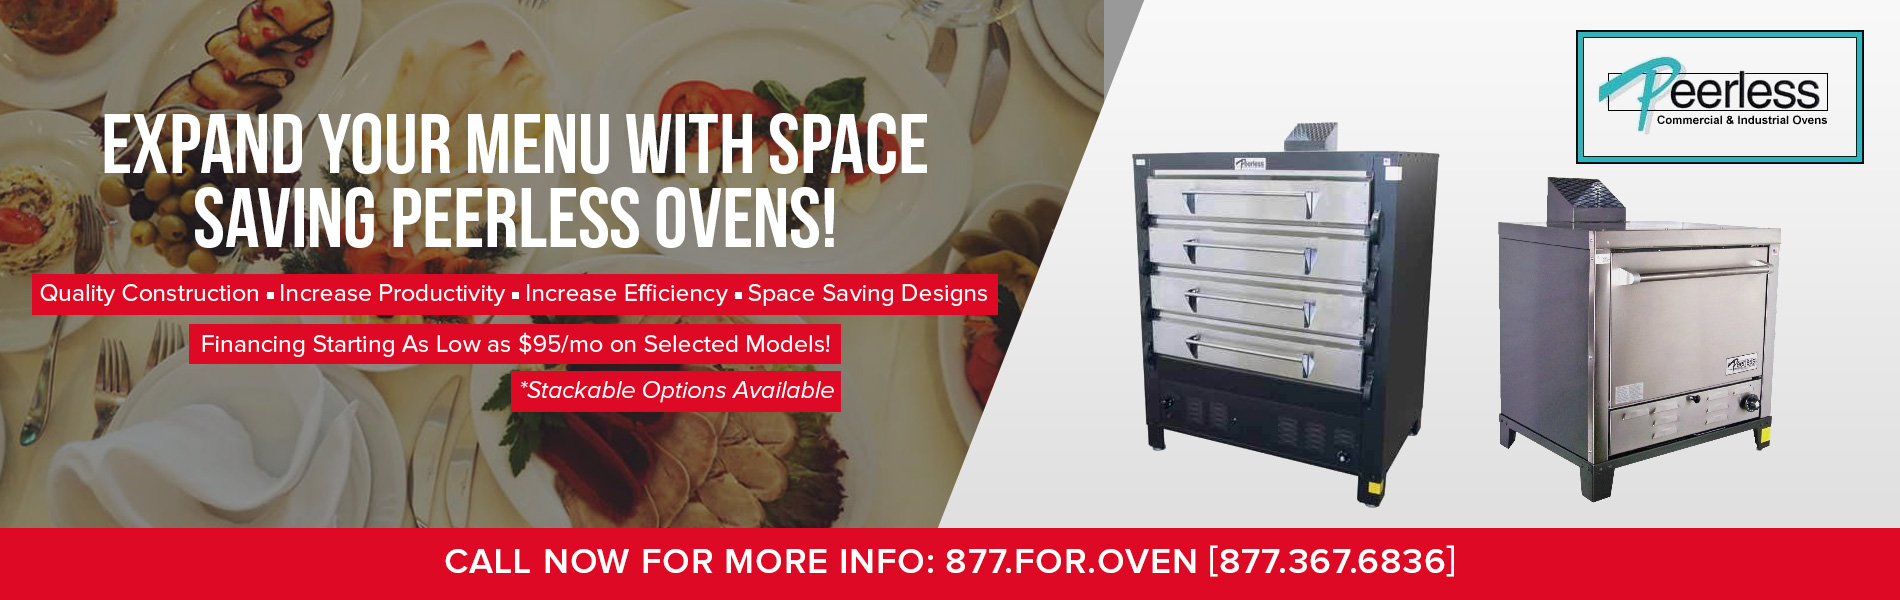 Peerless02 Pizza Oven